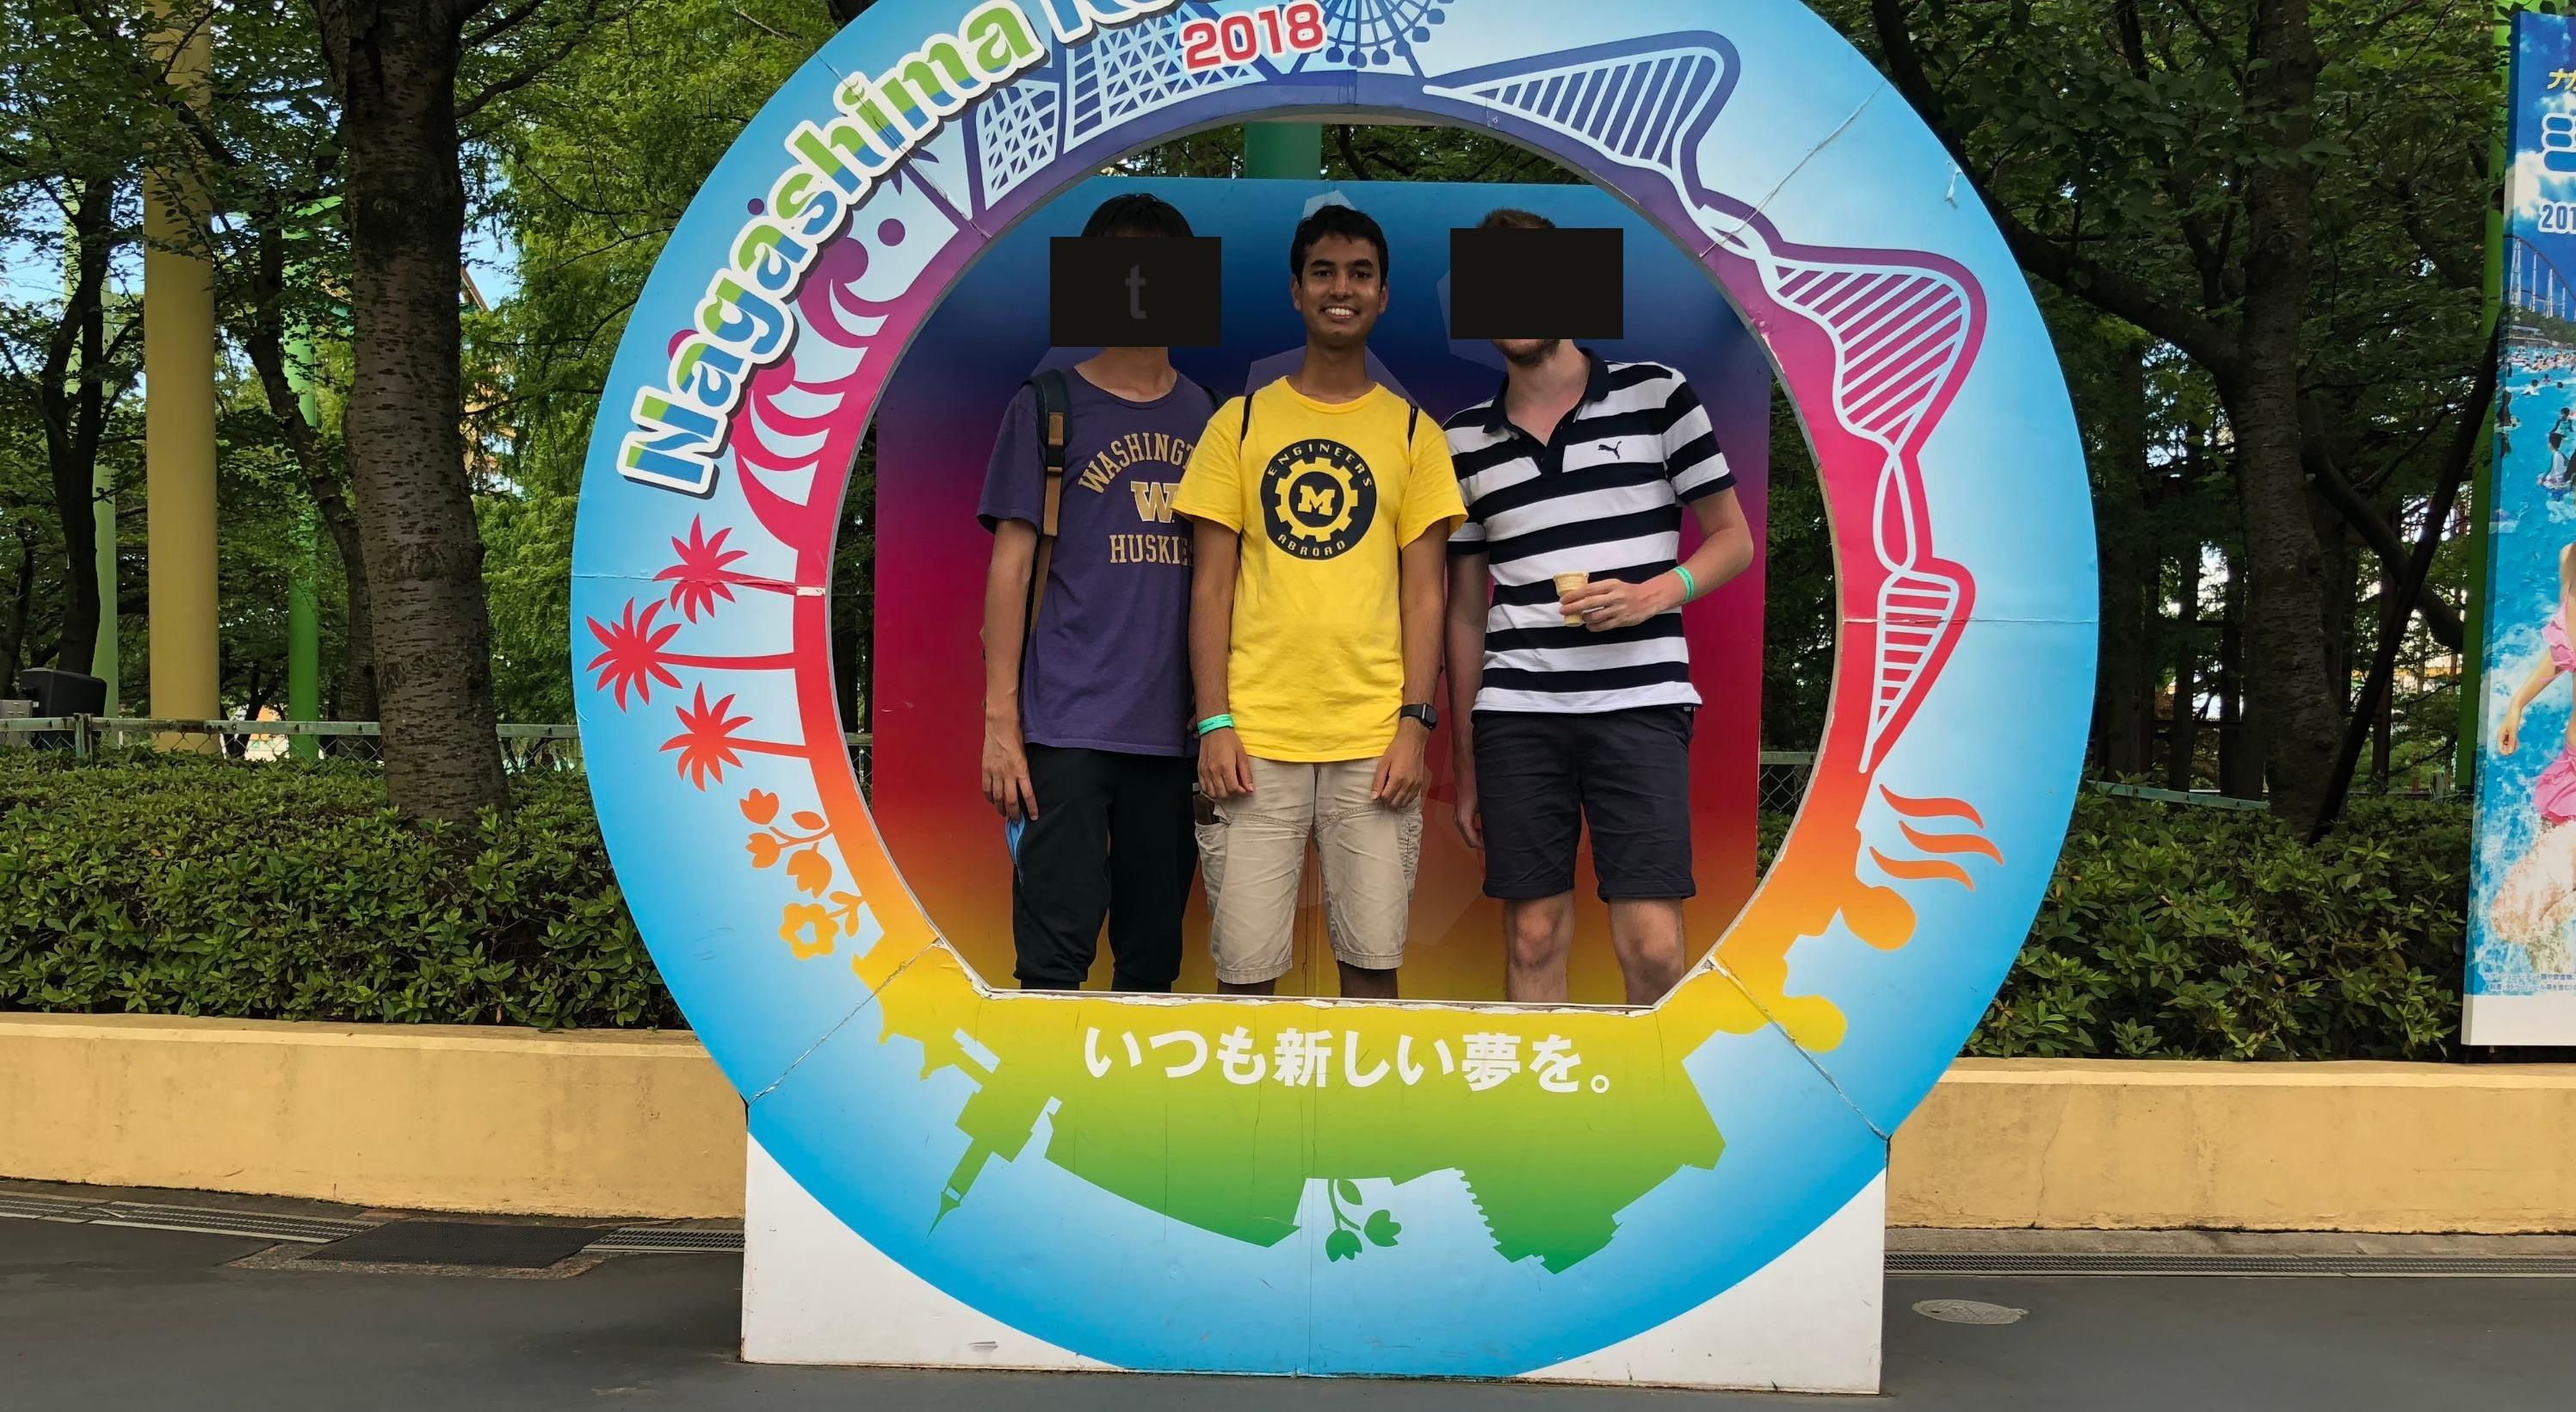 20-Nagashima_Spaland04_edited_edited